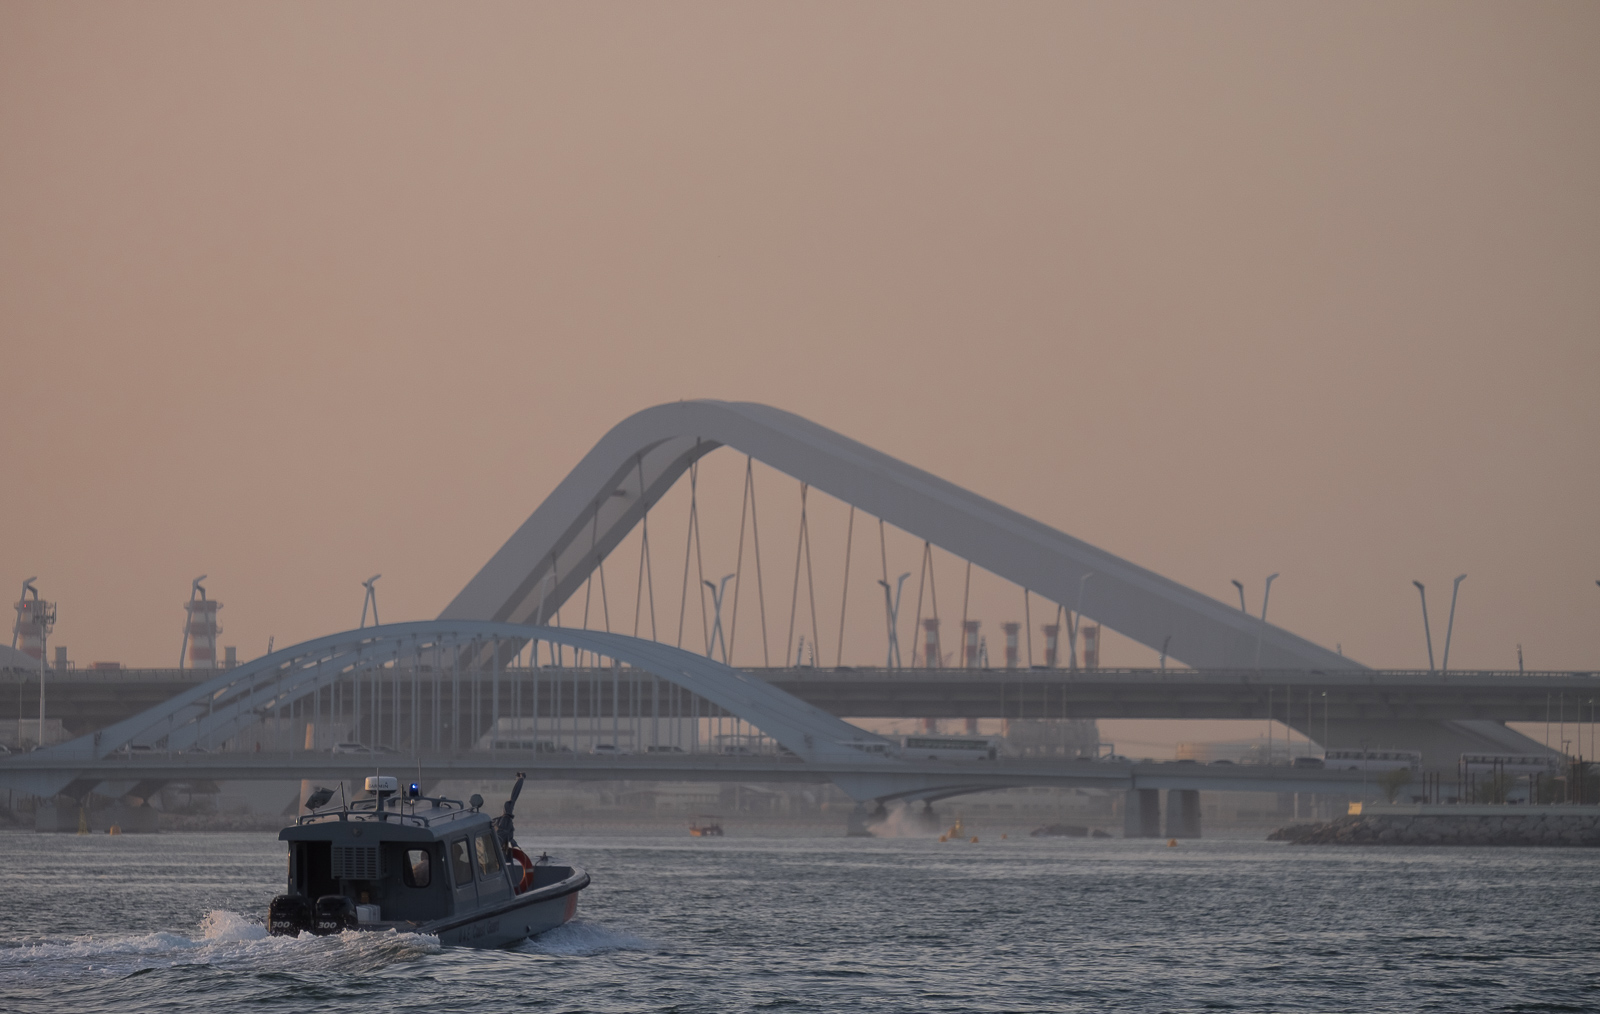 The Sheikh Zayed Bridge, Abu Dhabi